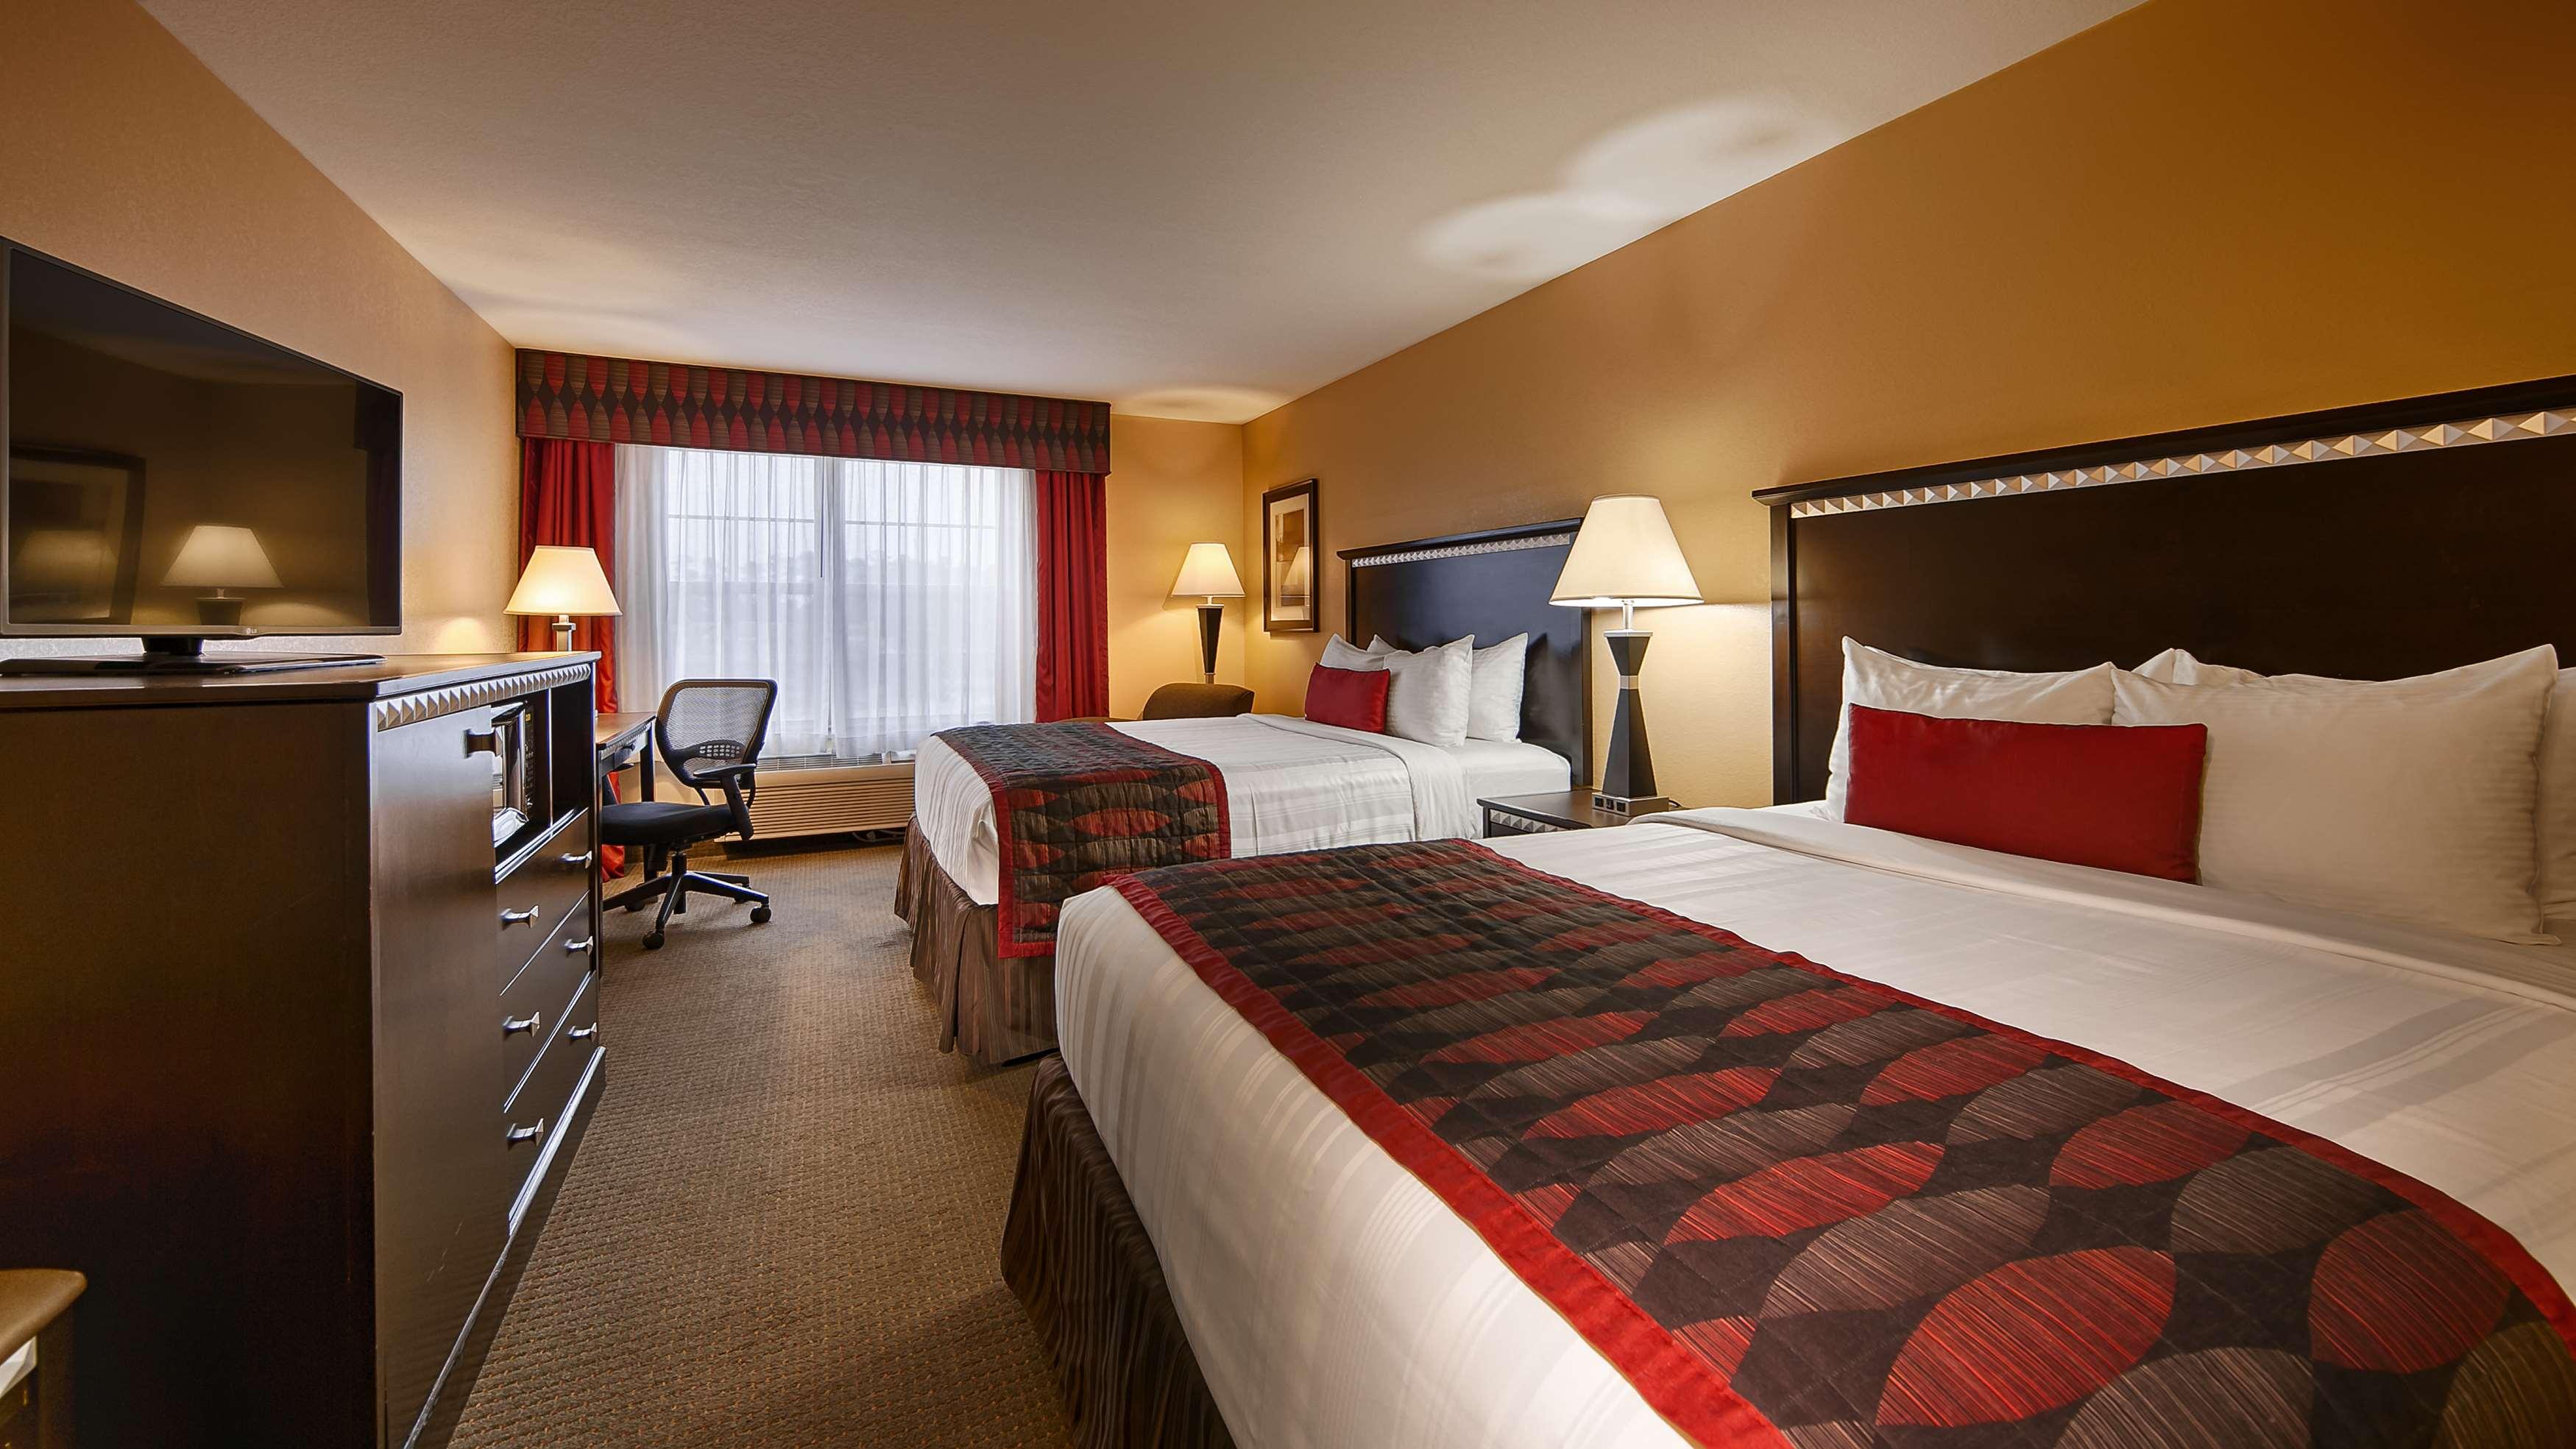 Best Western Plus Bessemer Hotel & Suites image 9